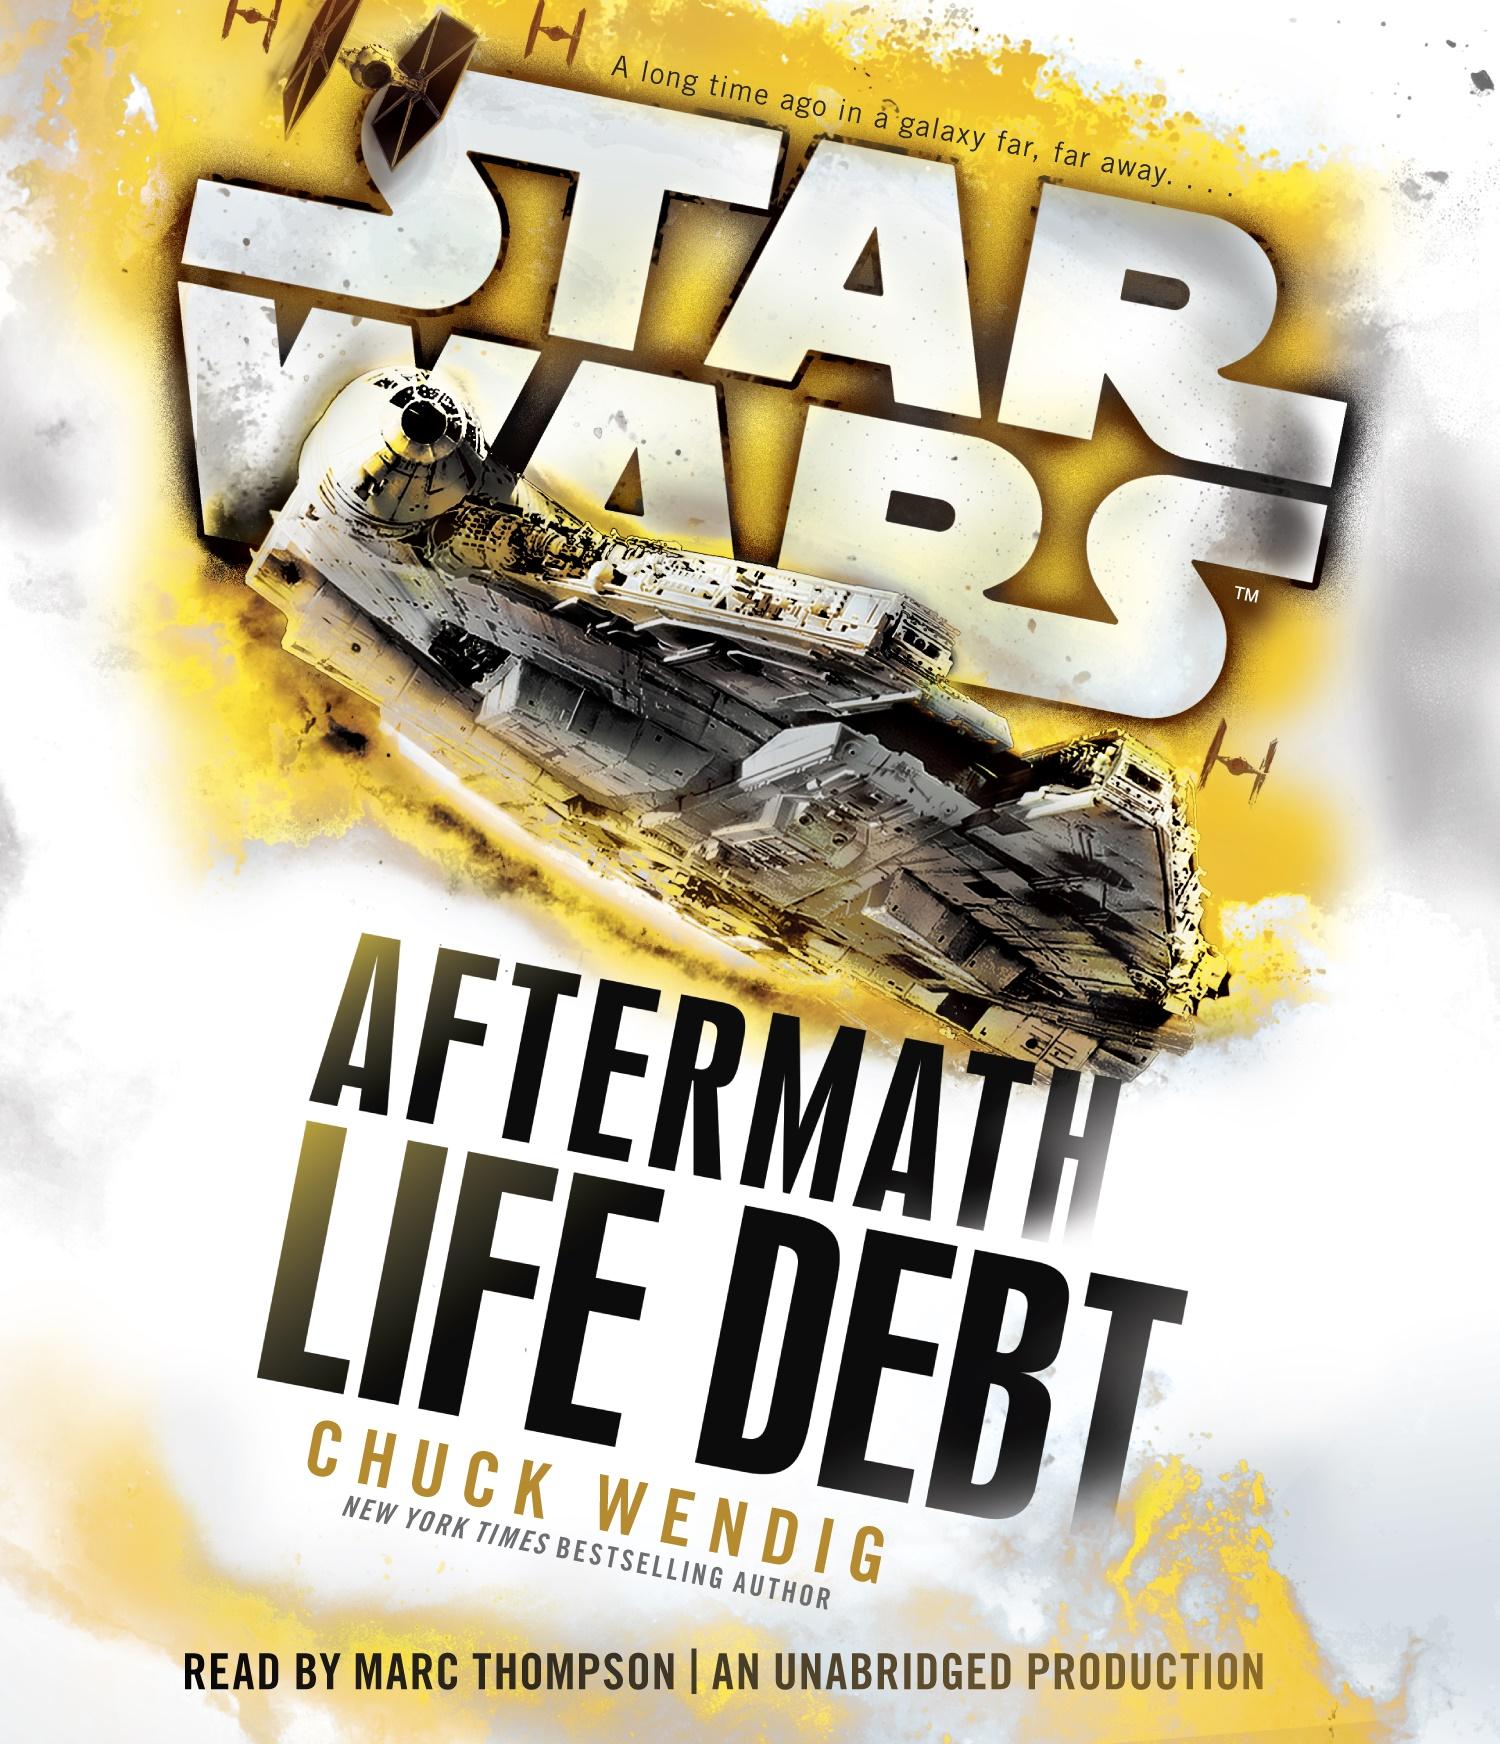 AftermathLifeDebt-Audiobook